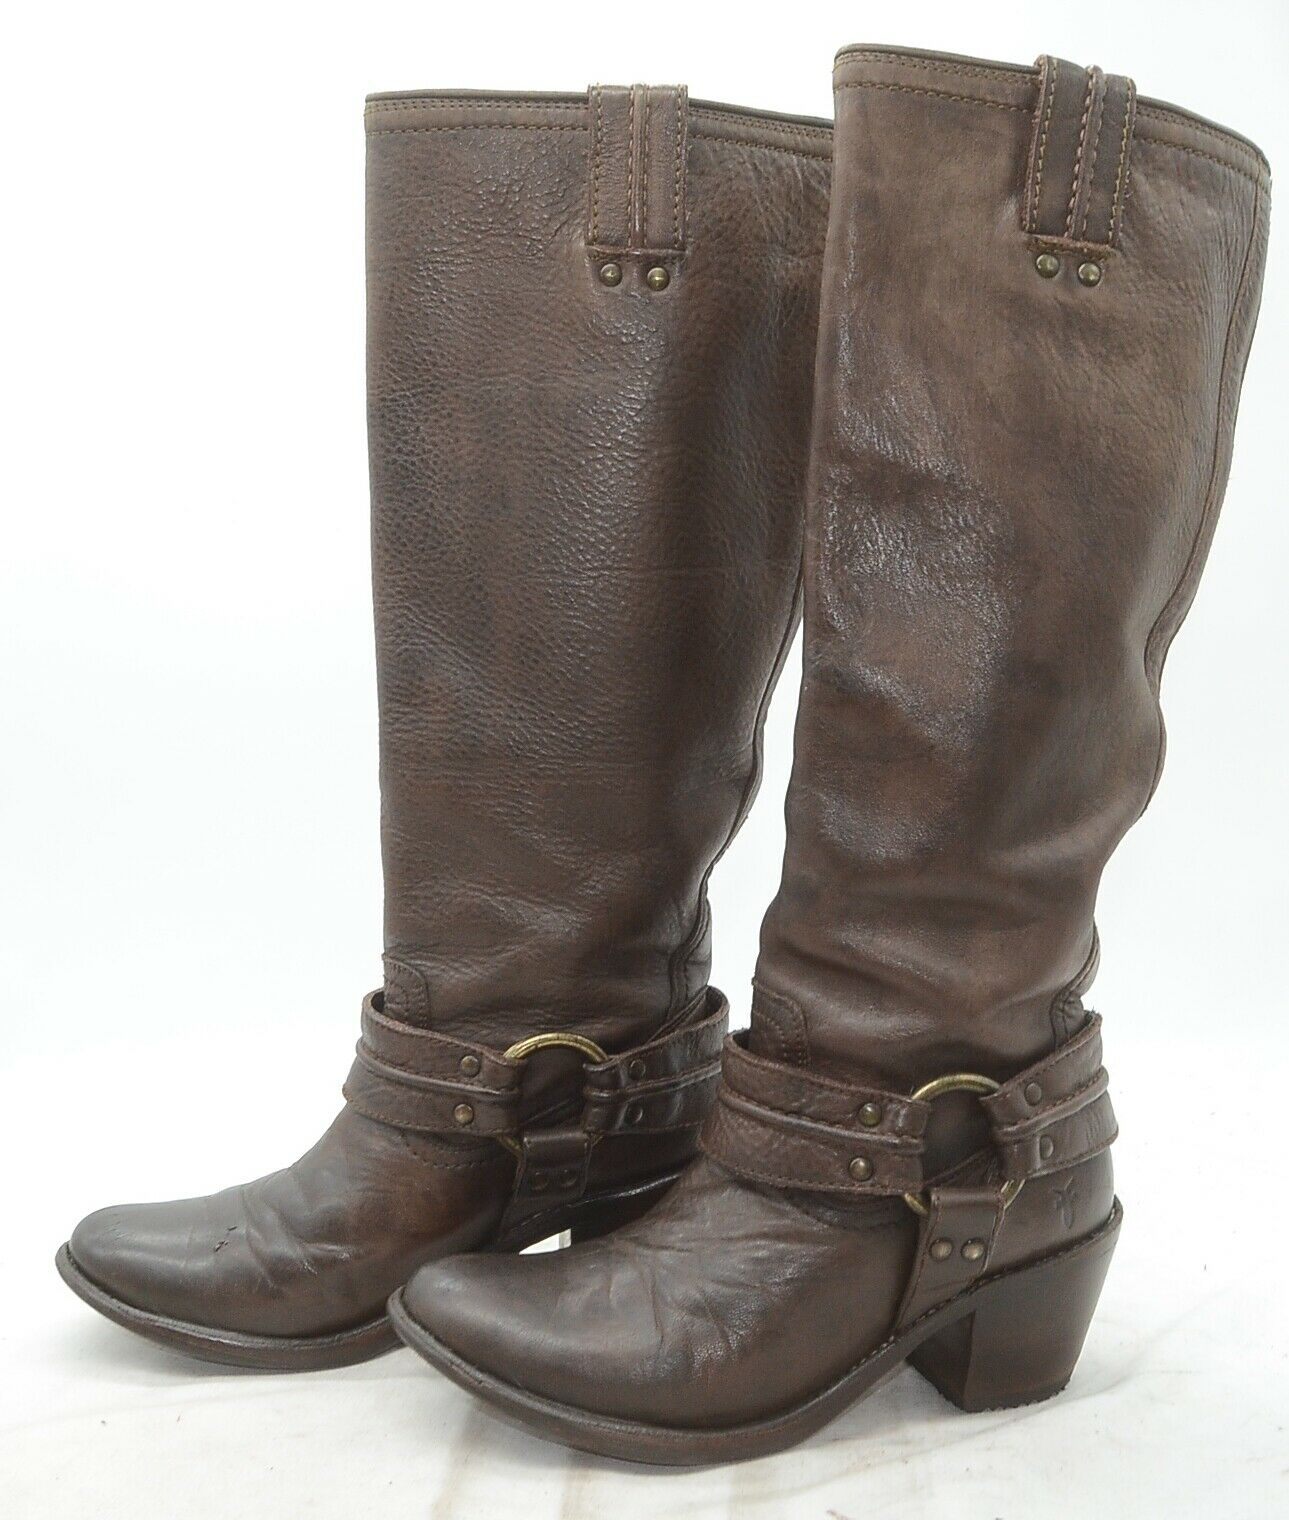 Frye Carmen Tall Harness Brown Slouch High Heel Riding Boots Womens Sz 6